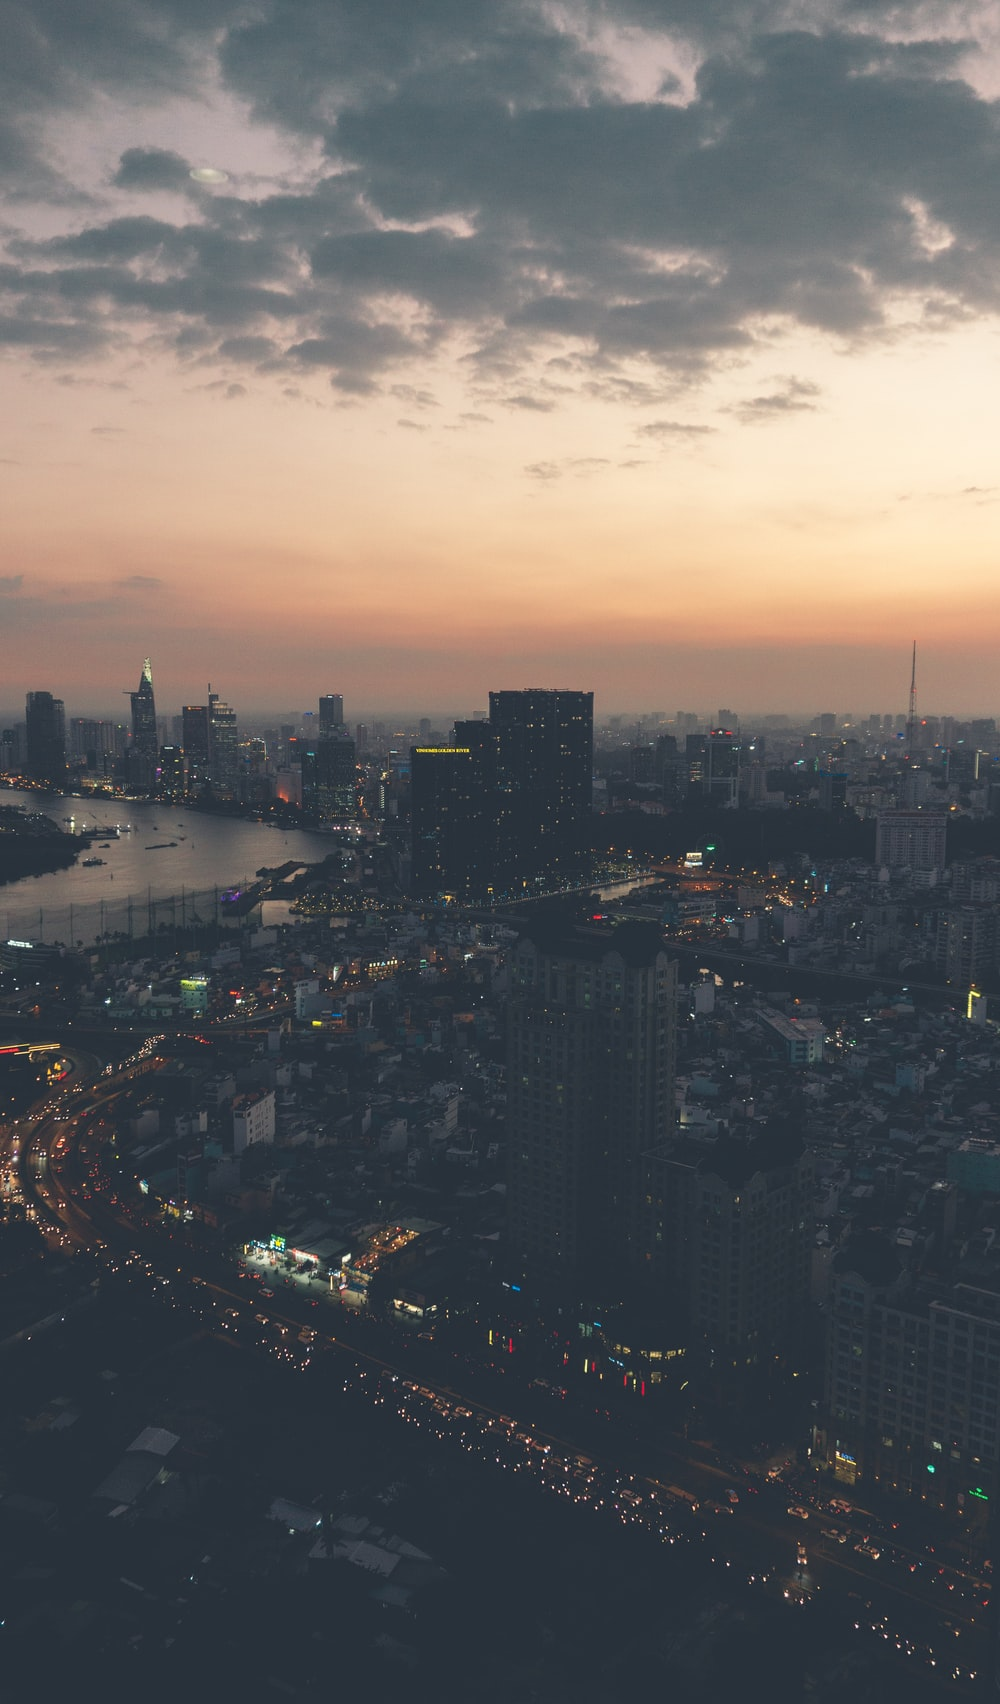 highrise buildings under golden hour